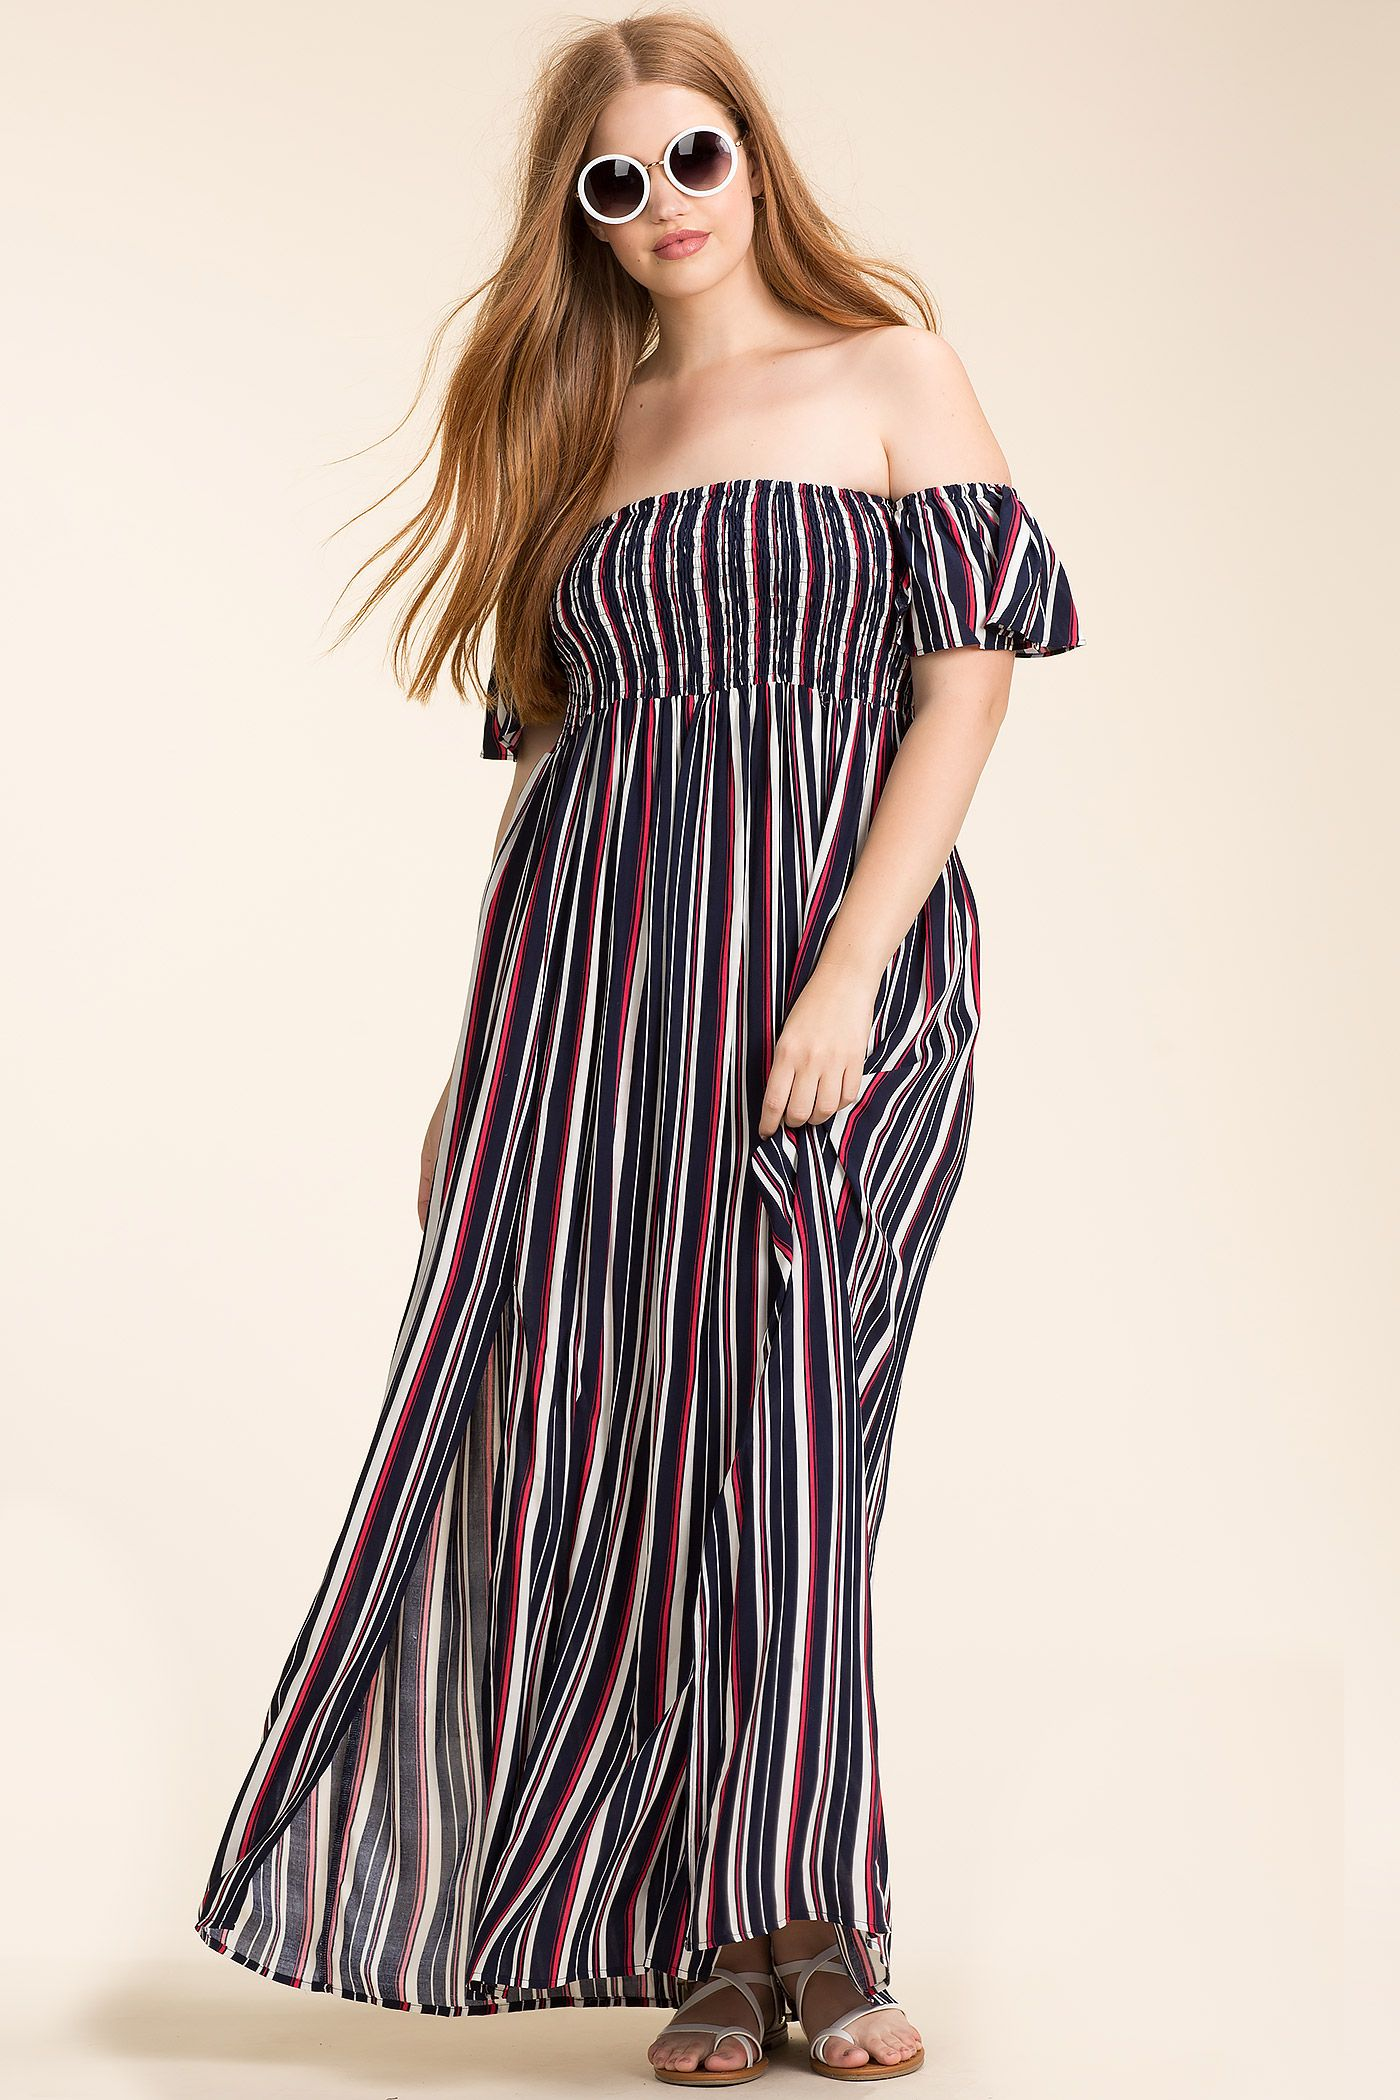 Affordable Plus Size Fashion // Fatgirlflow.com